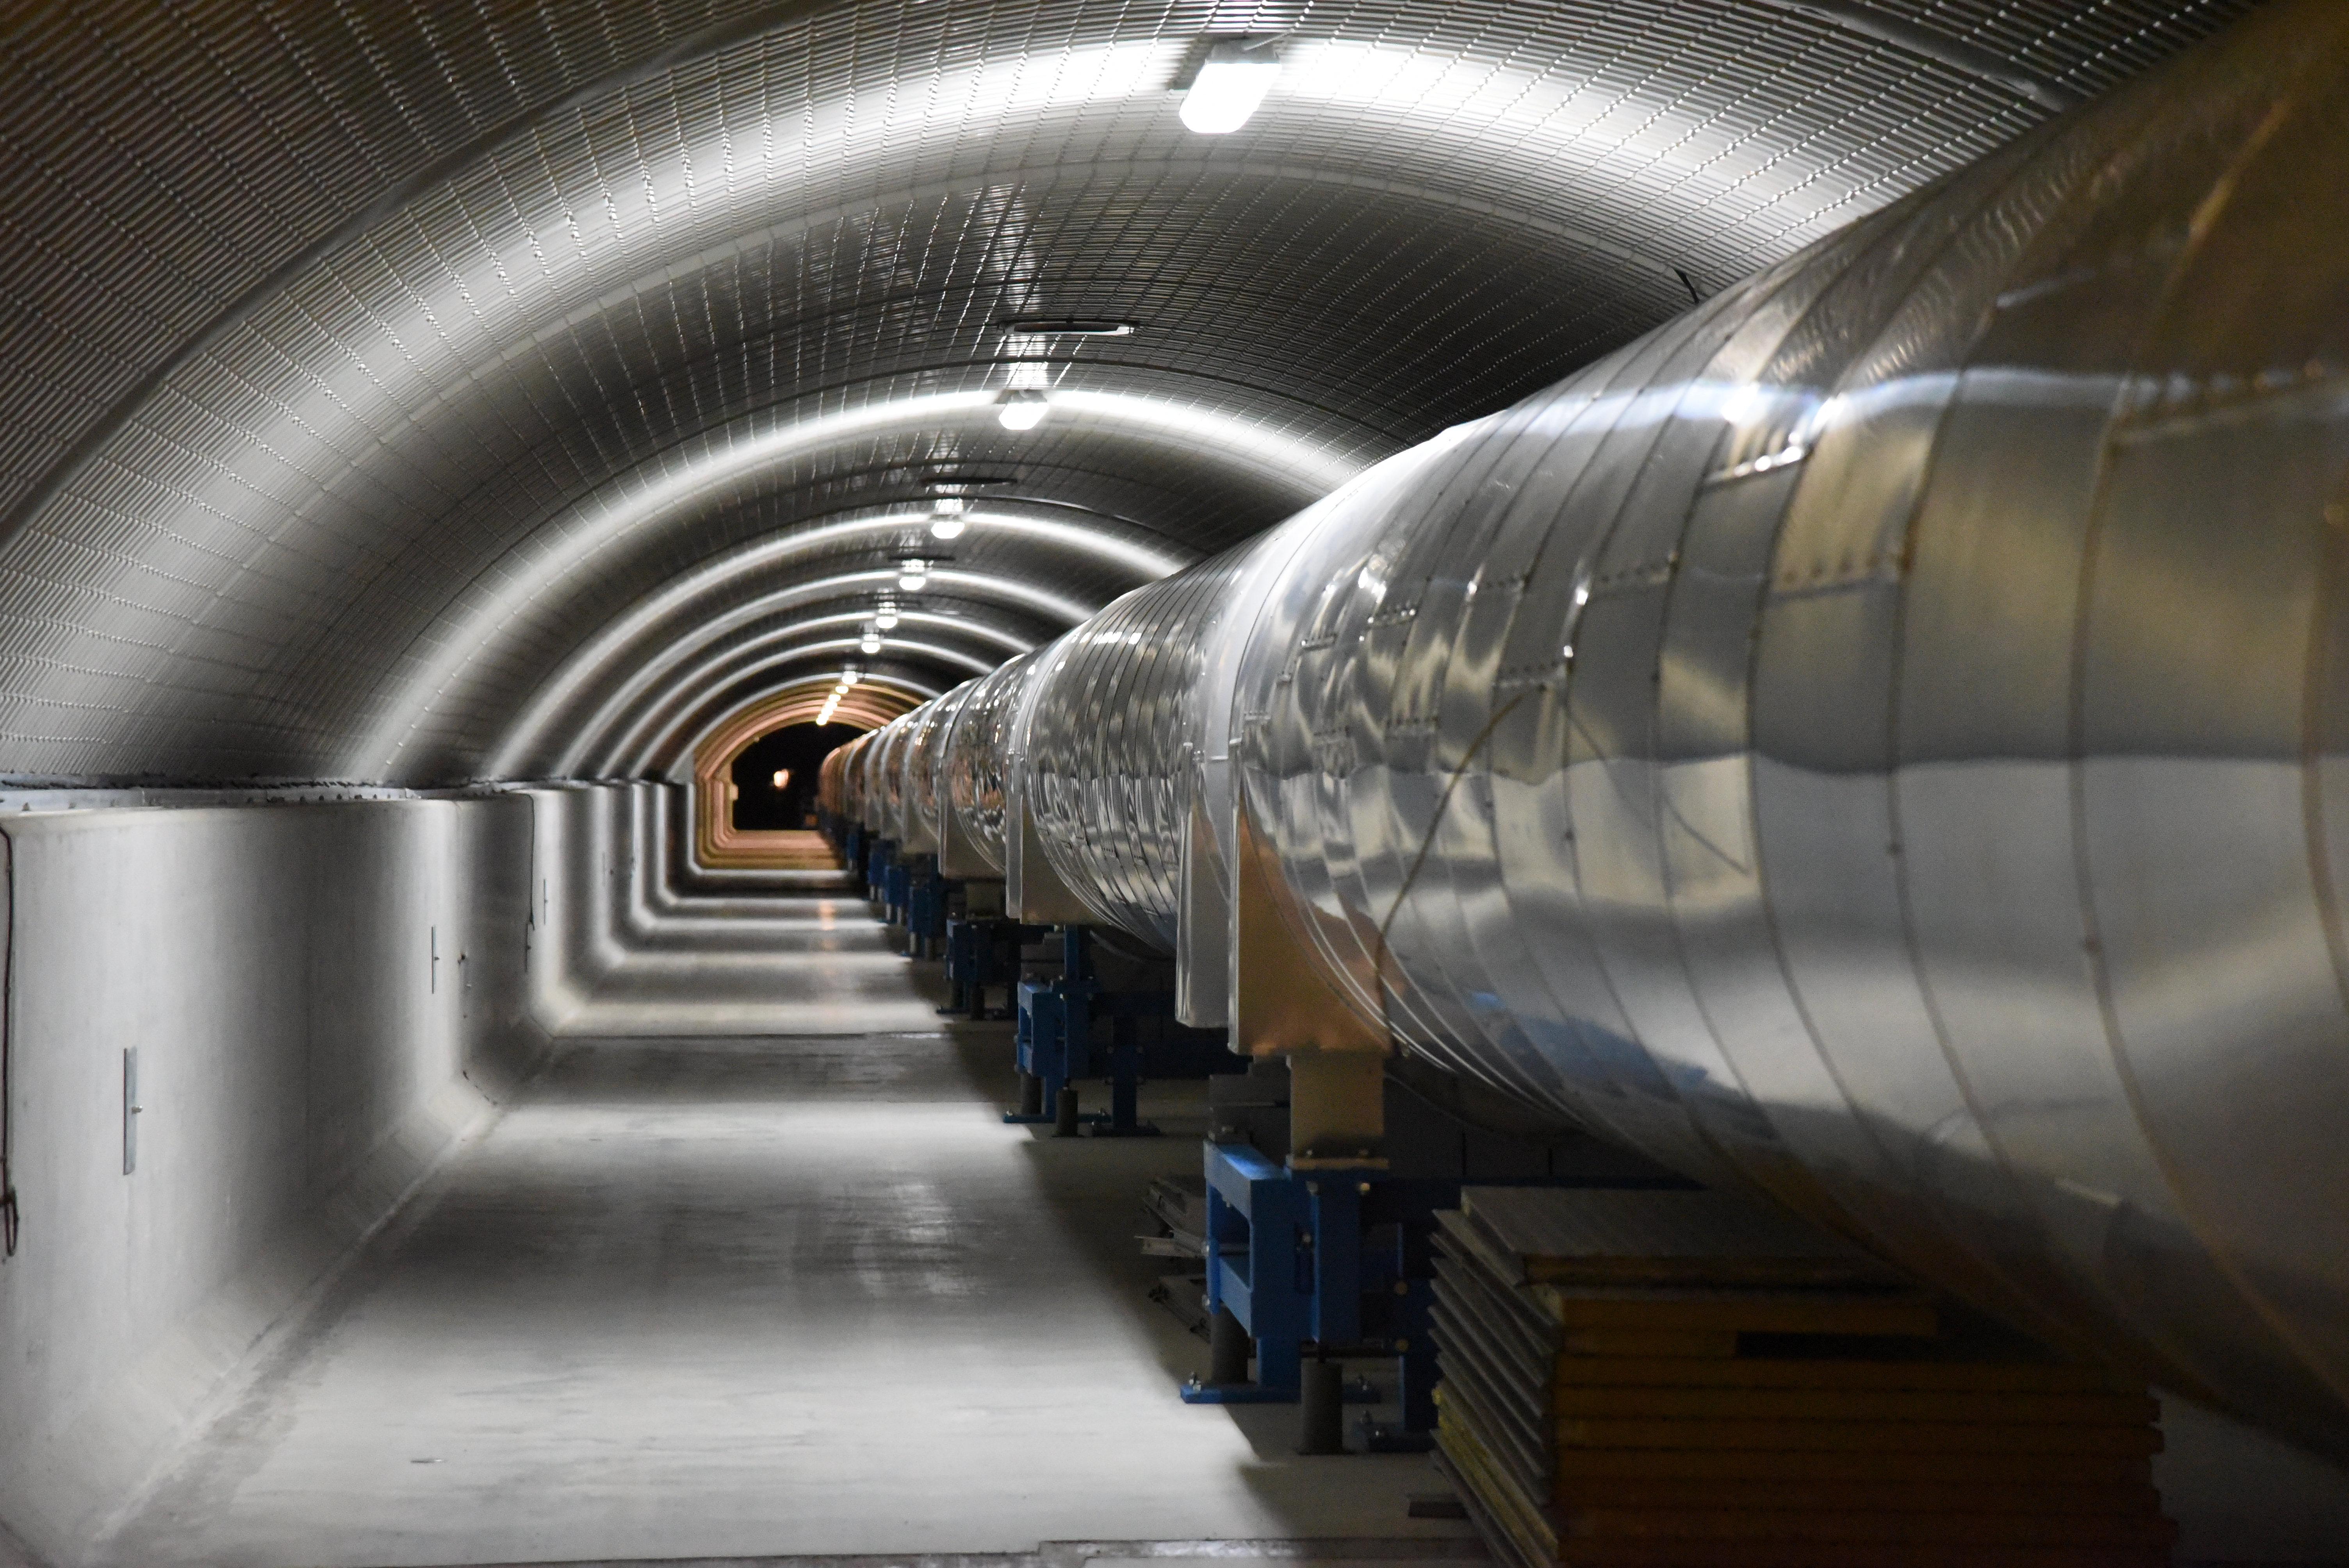 Interferómetro diseñado para detectar ondas gravitacionales en Pisa, Italia | Agence France-Presse